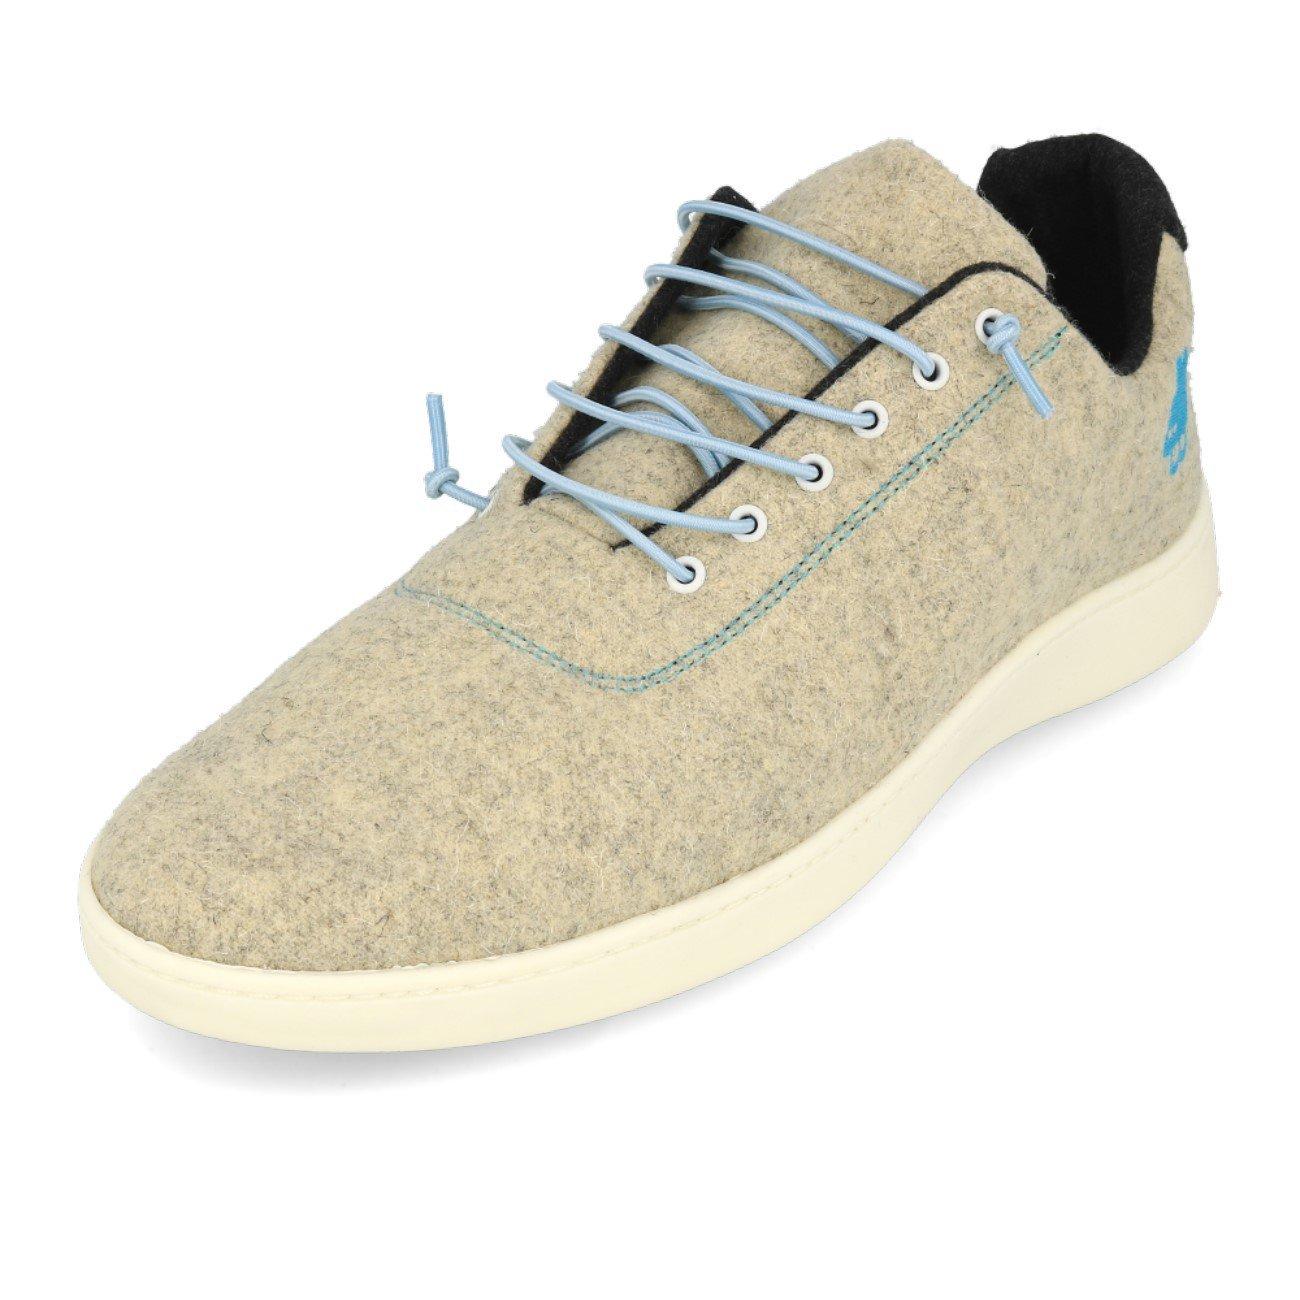 Baabuk B077G7YDRM Unisex Urban Wooler Sneaker B077G7YDRM Baabuk Fashion Sneakers 7e54cb